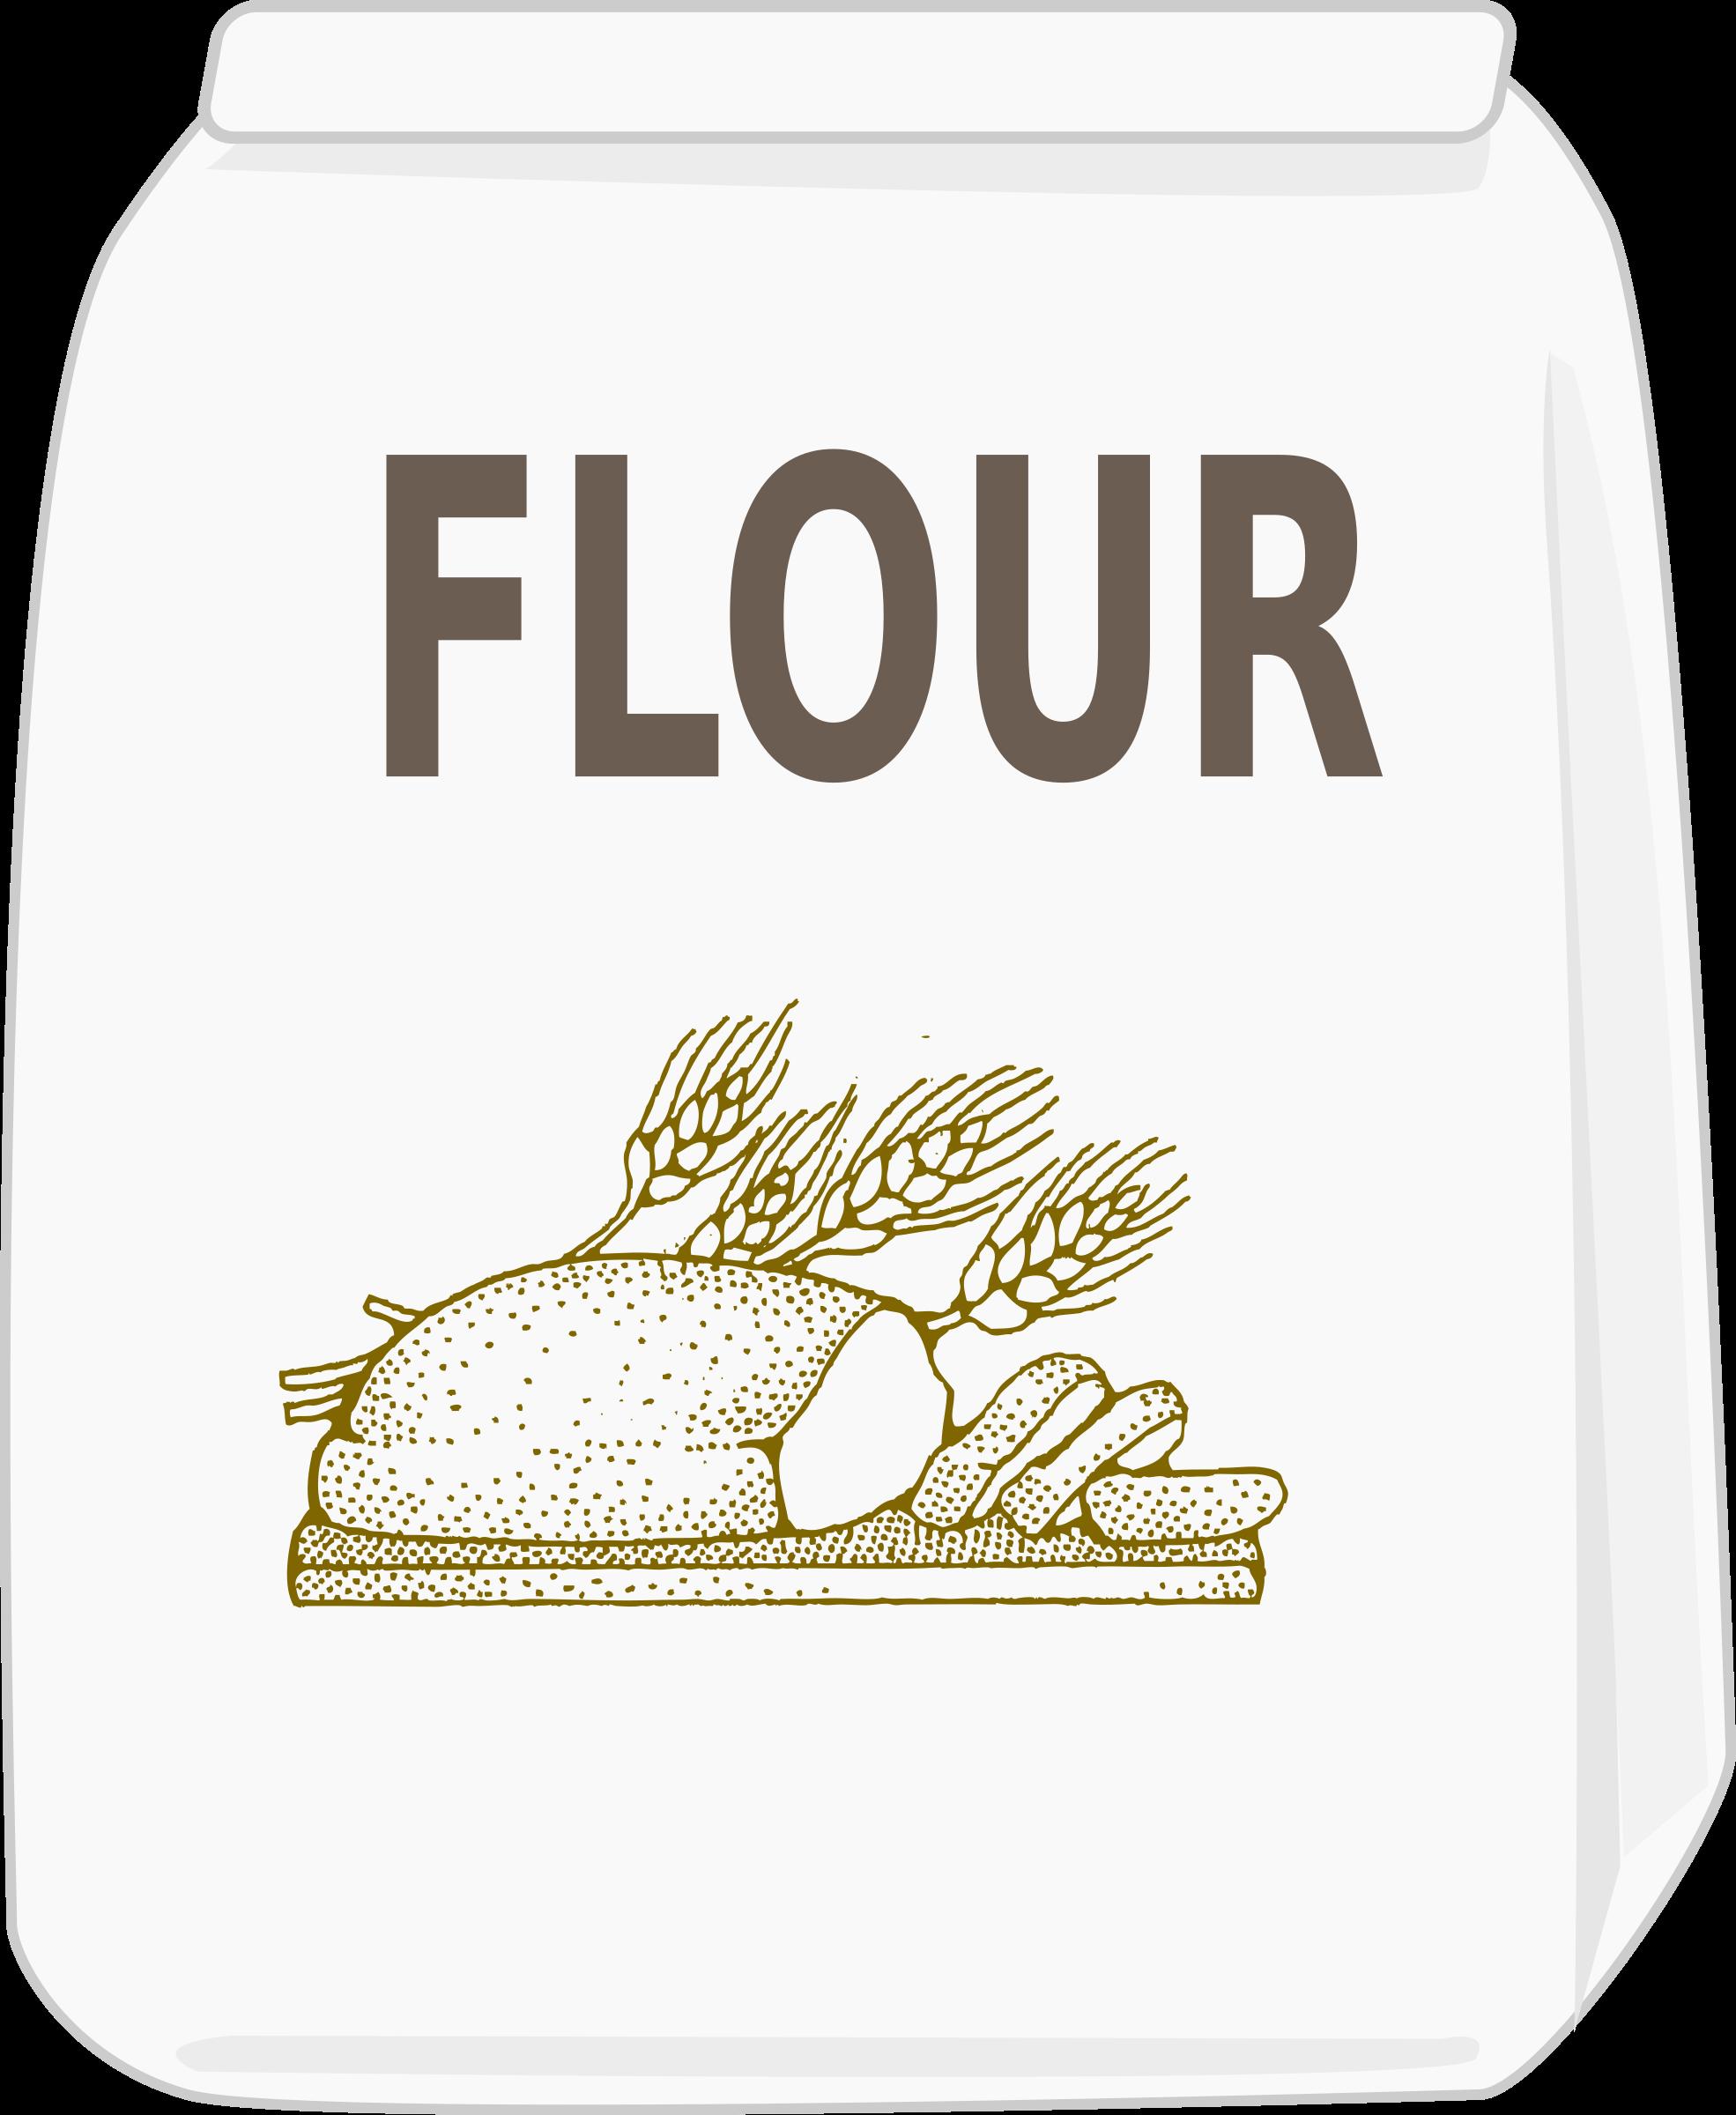 Flour clipart all purpose flour. Free cliparts download clip